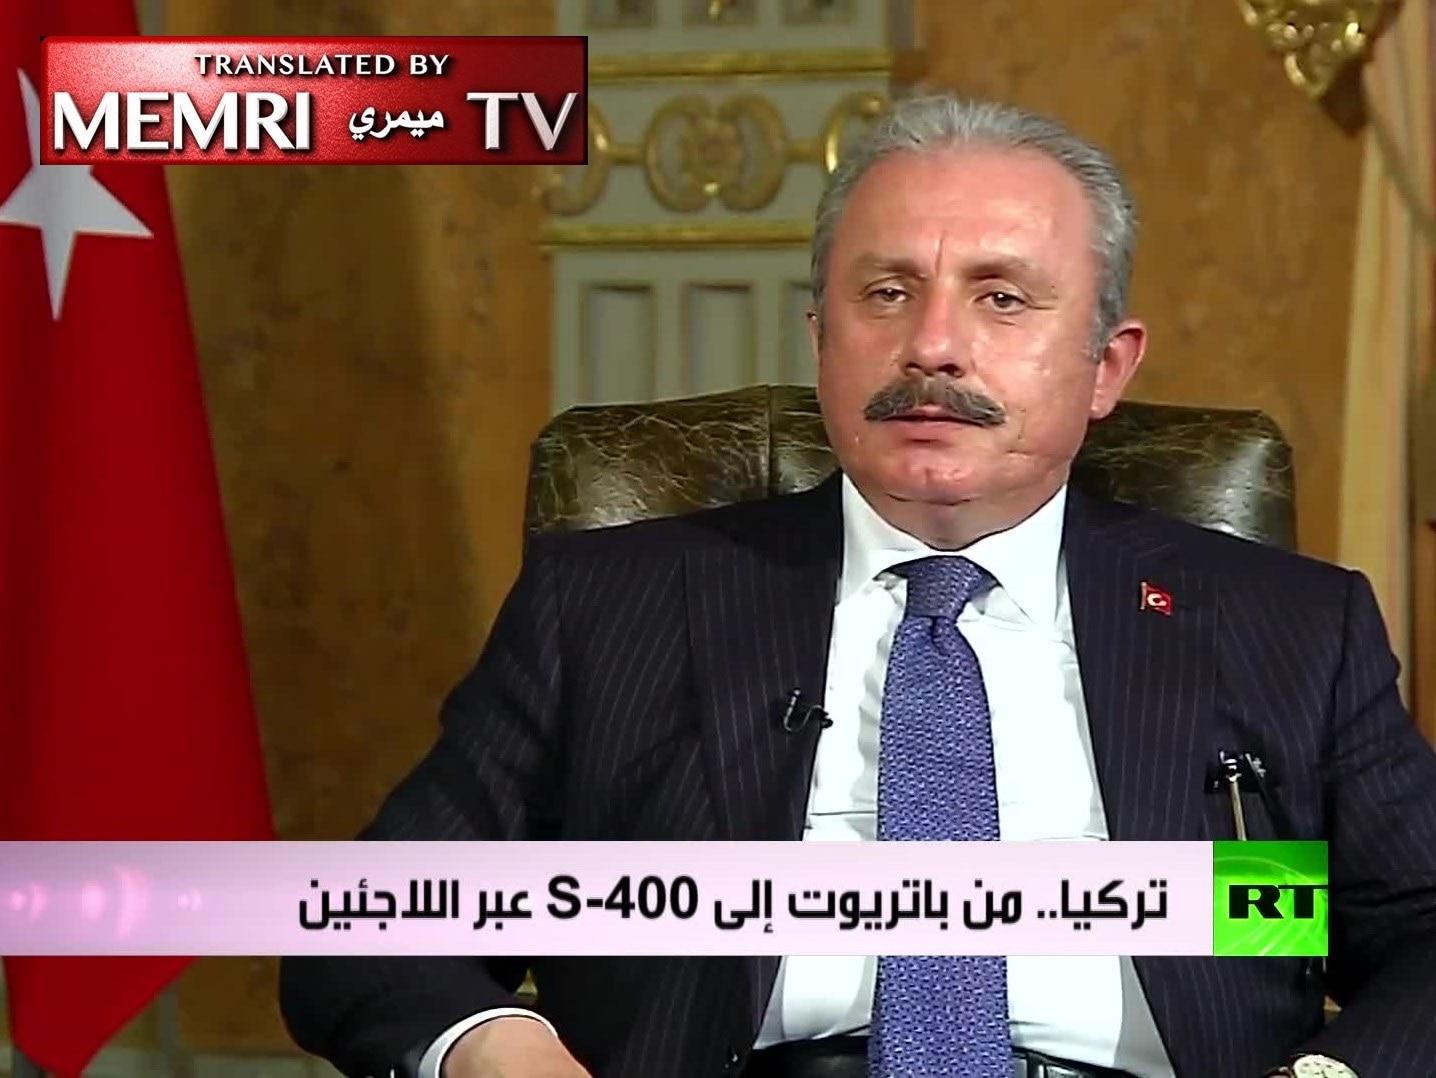 Iranian Video With Threats to Close Strait of Hormuz   MEMRI TV